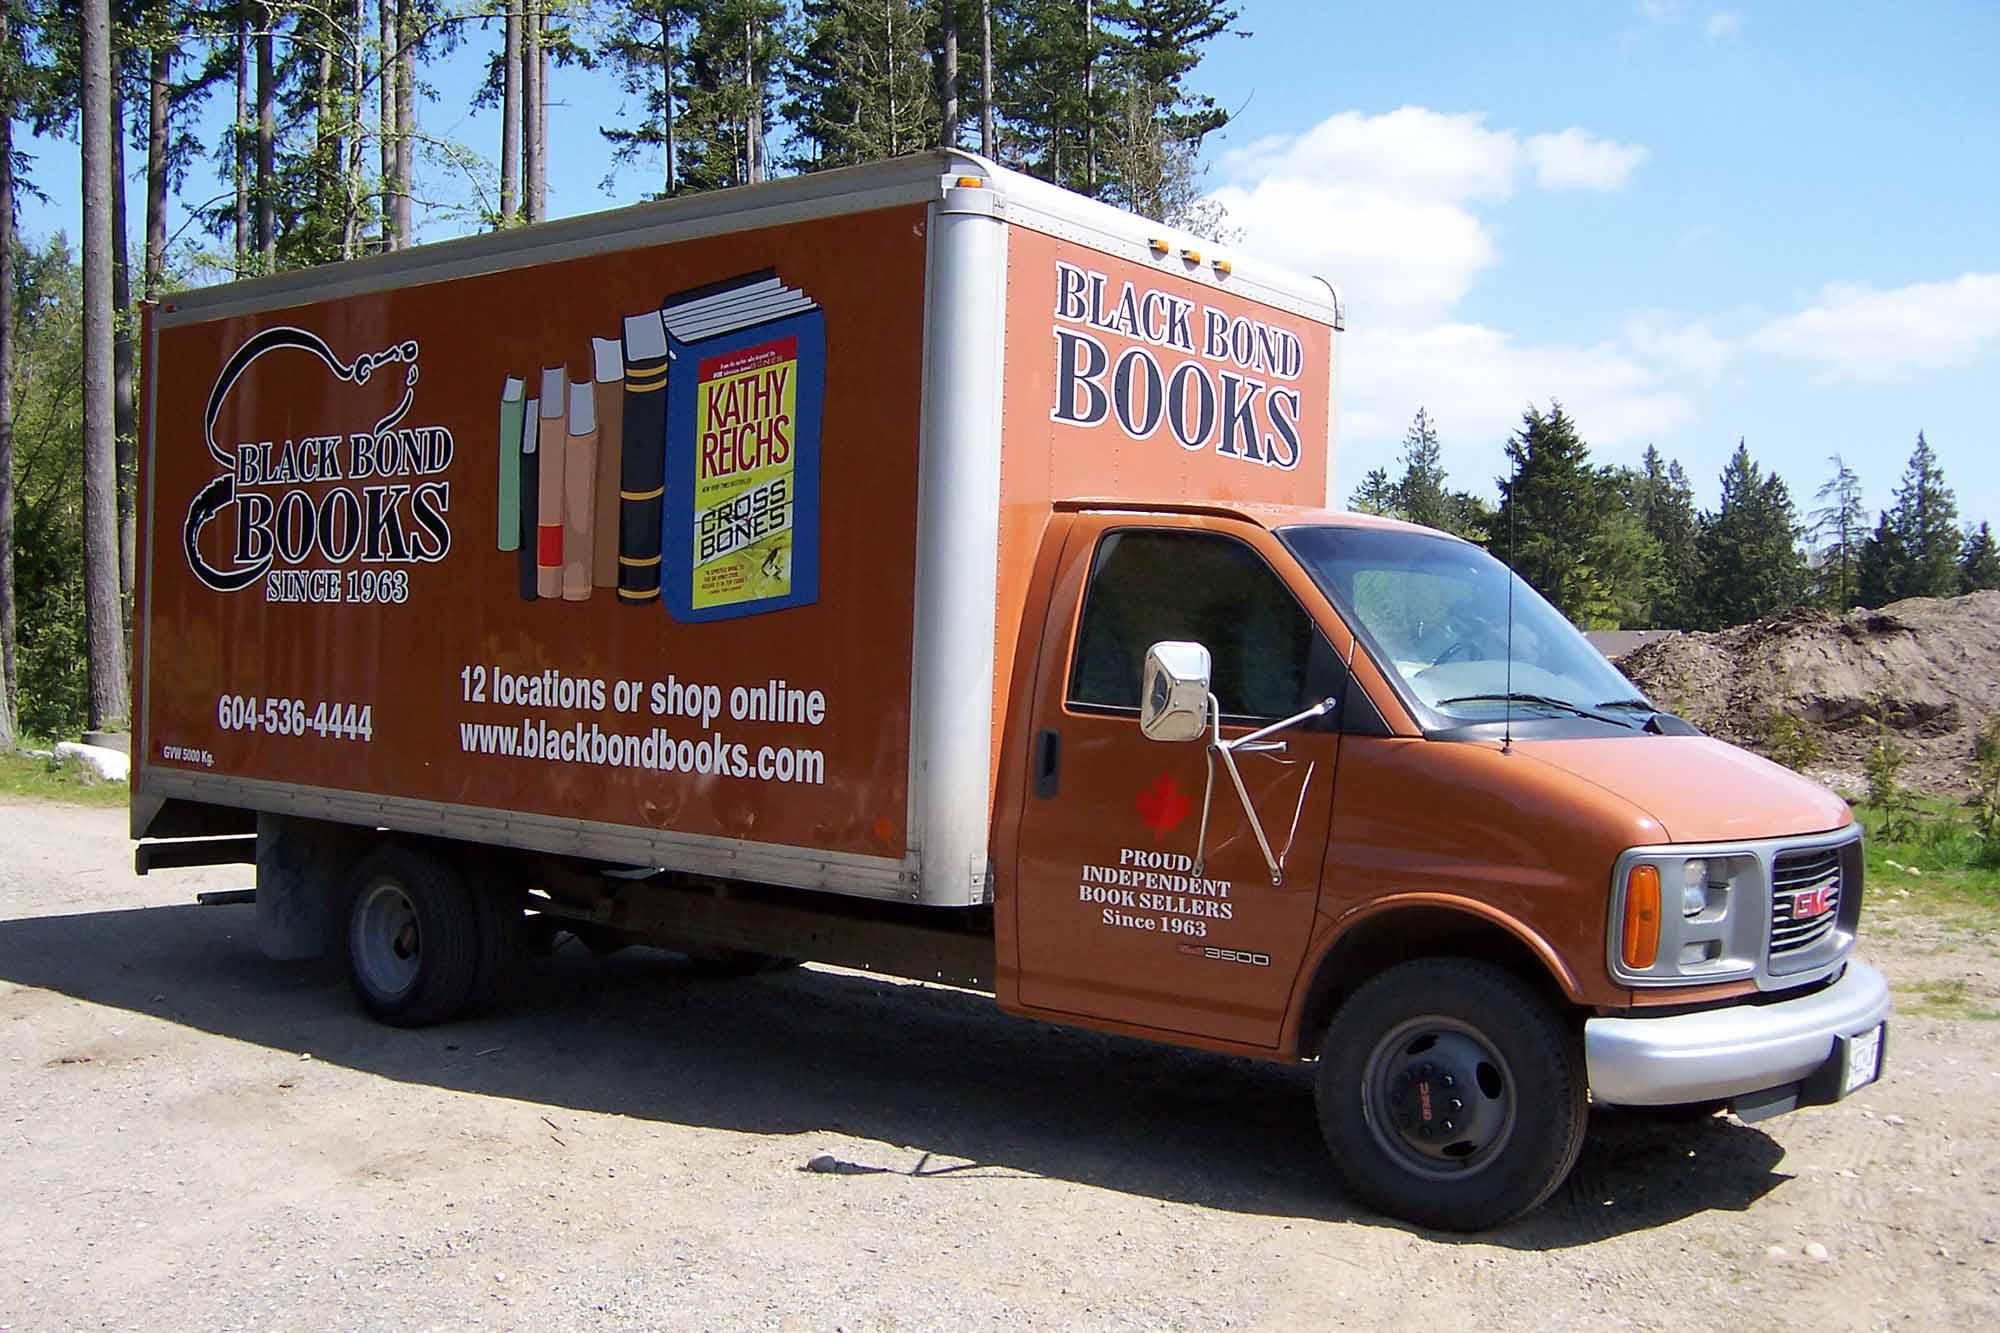 Blackbond truck